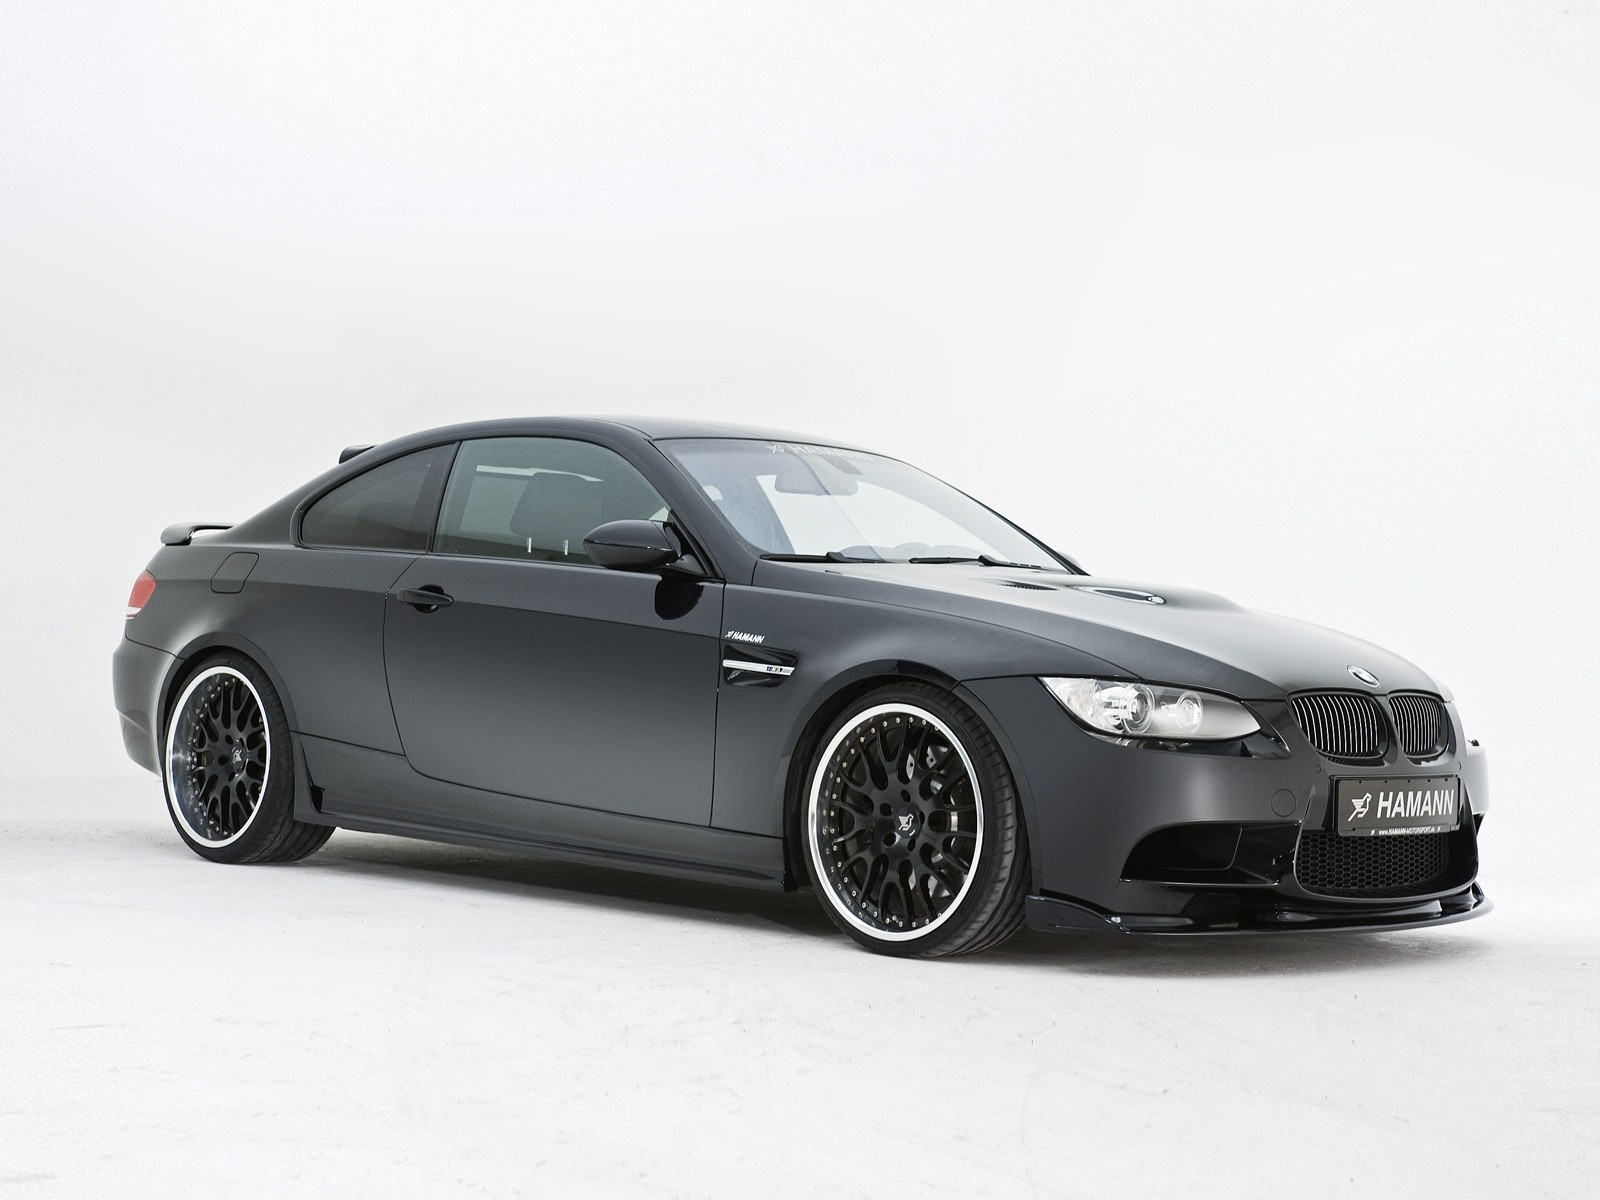 BMW M3 Wallpapers Wallpupcom 1600x1200